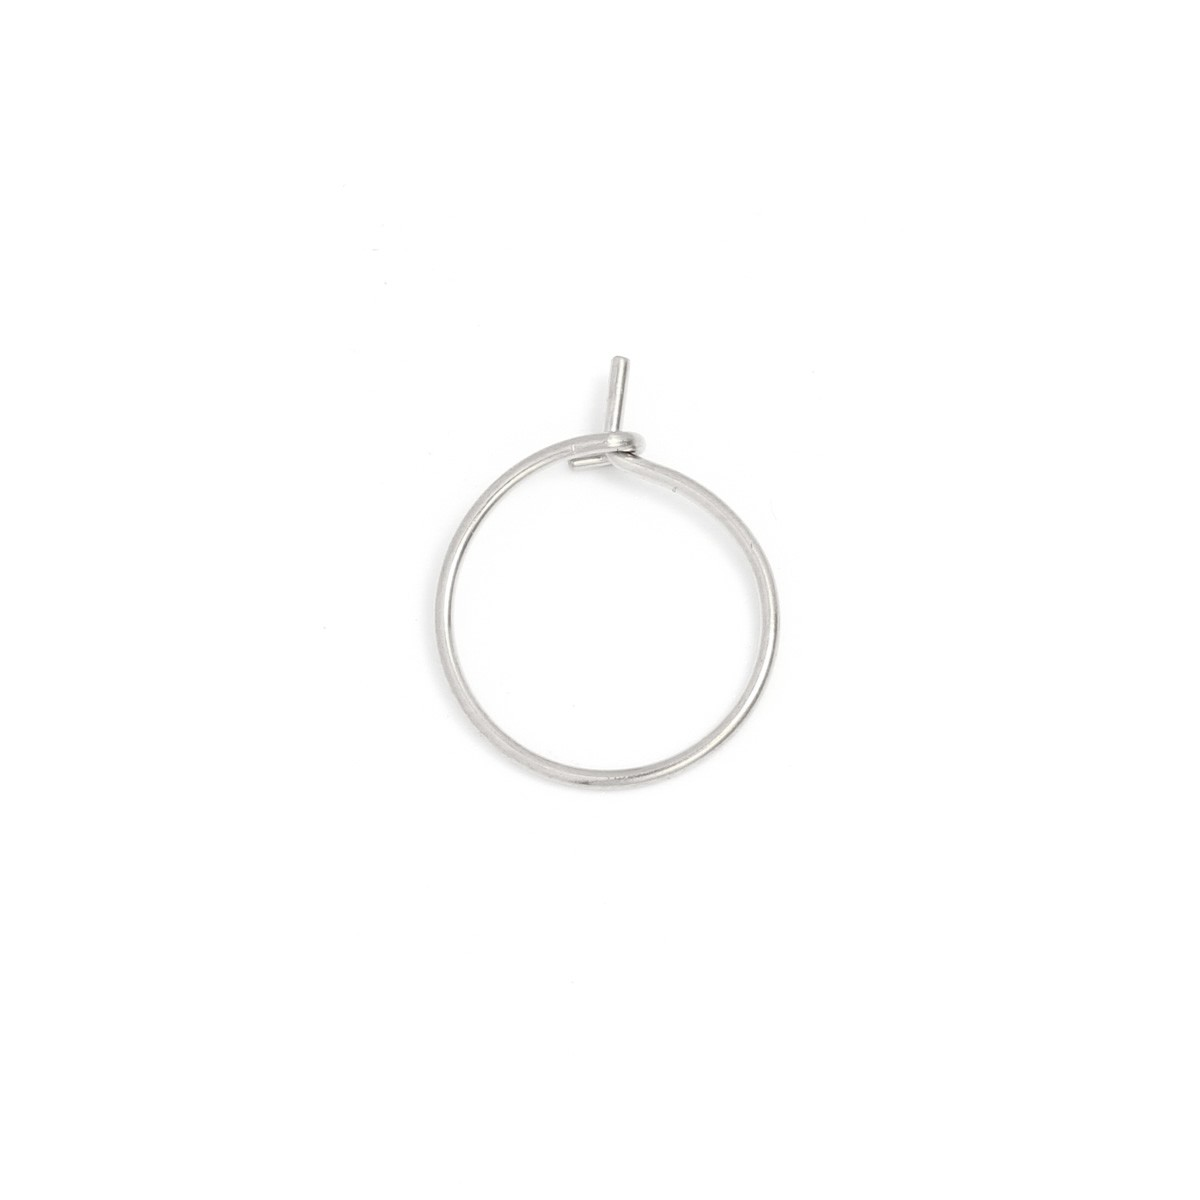 oorbellen-kleine-ring-stainless-steel-zilver-25mm-per-paar